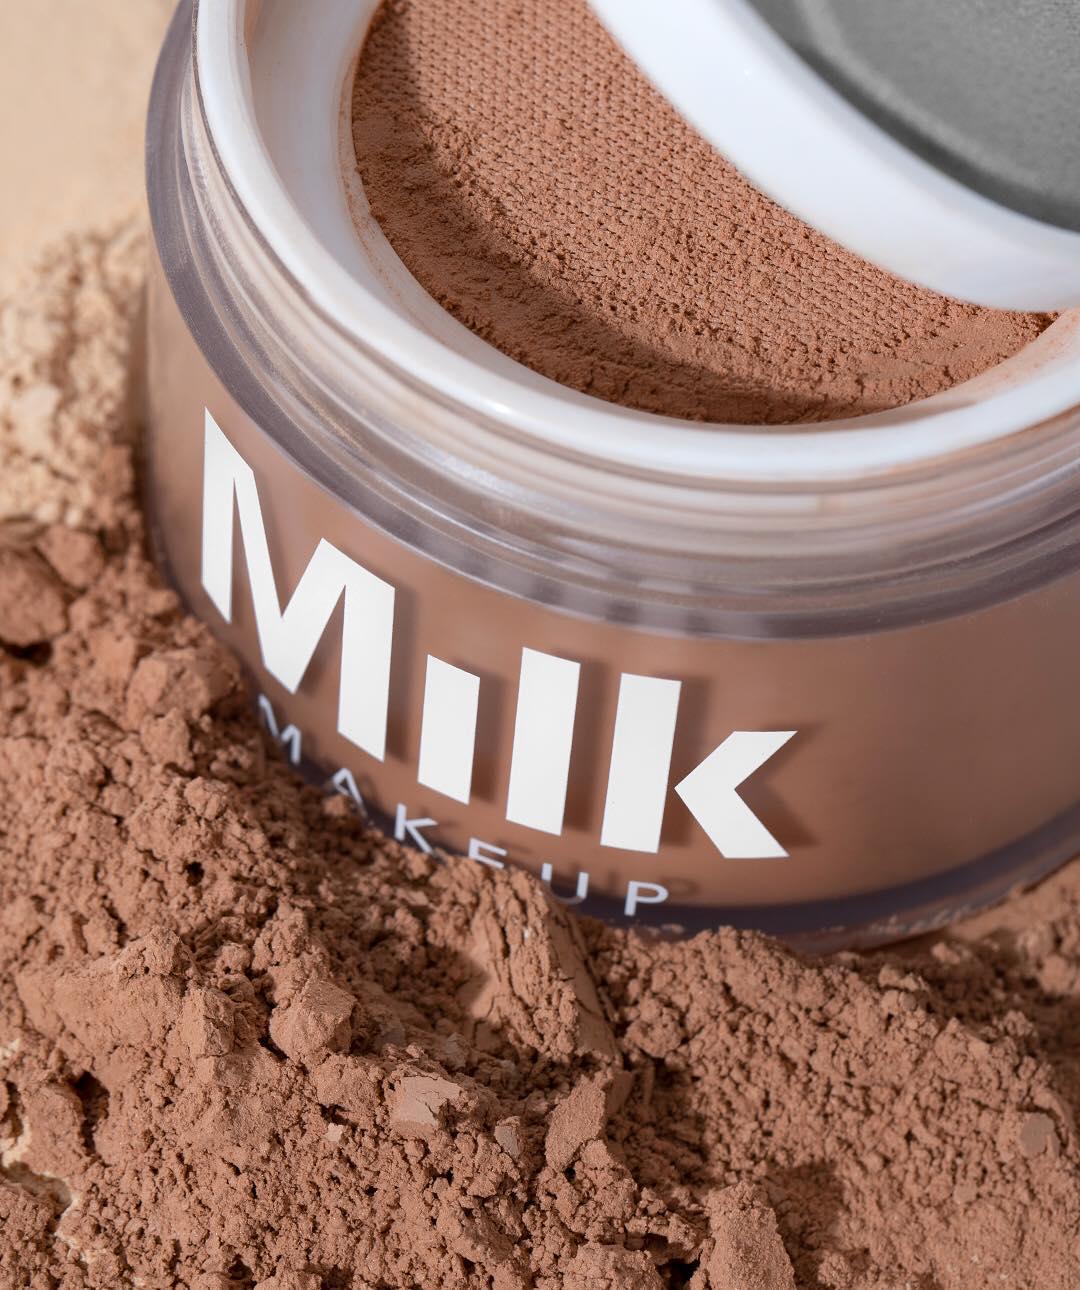 Blur + Set Matte Loose Setting Powder by Milk Makeup #14